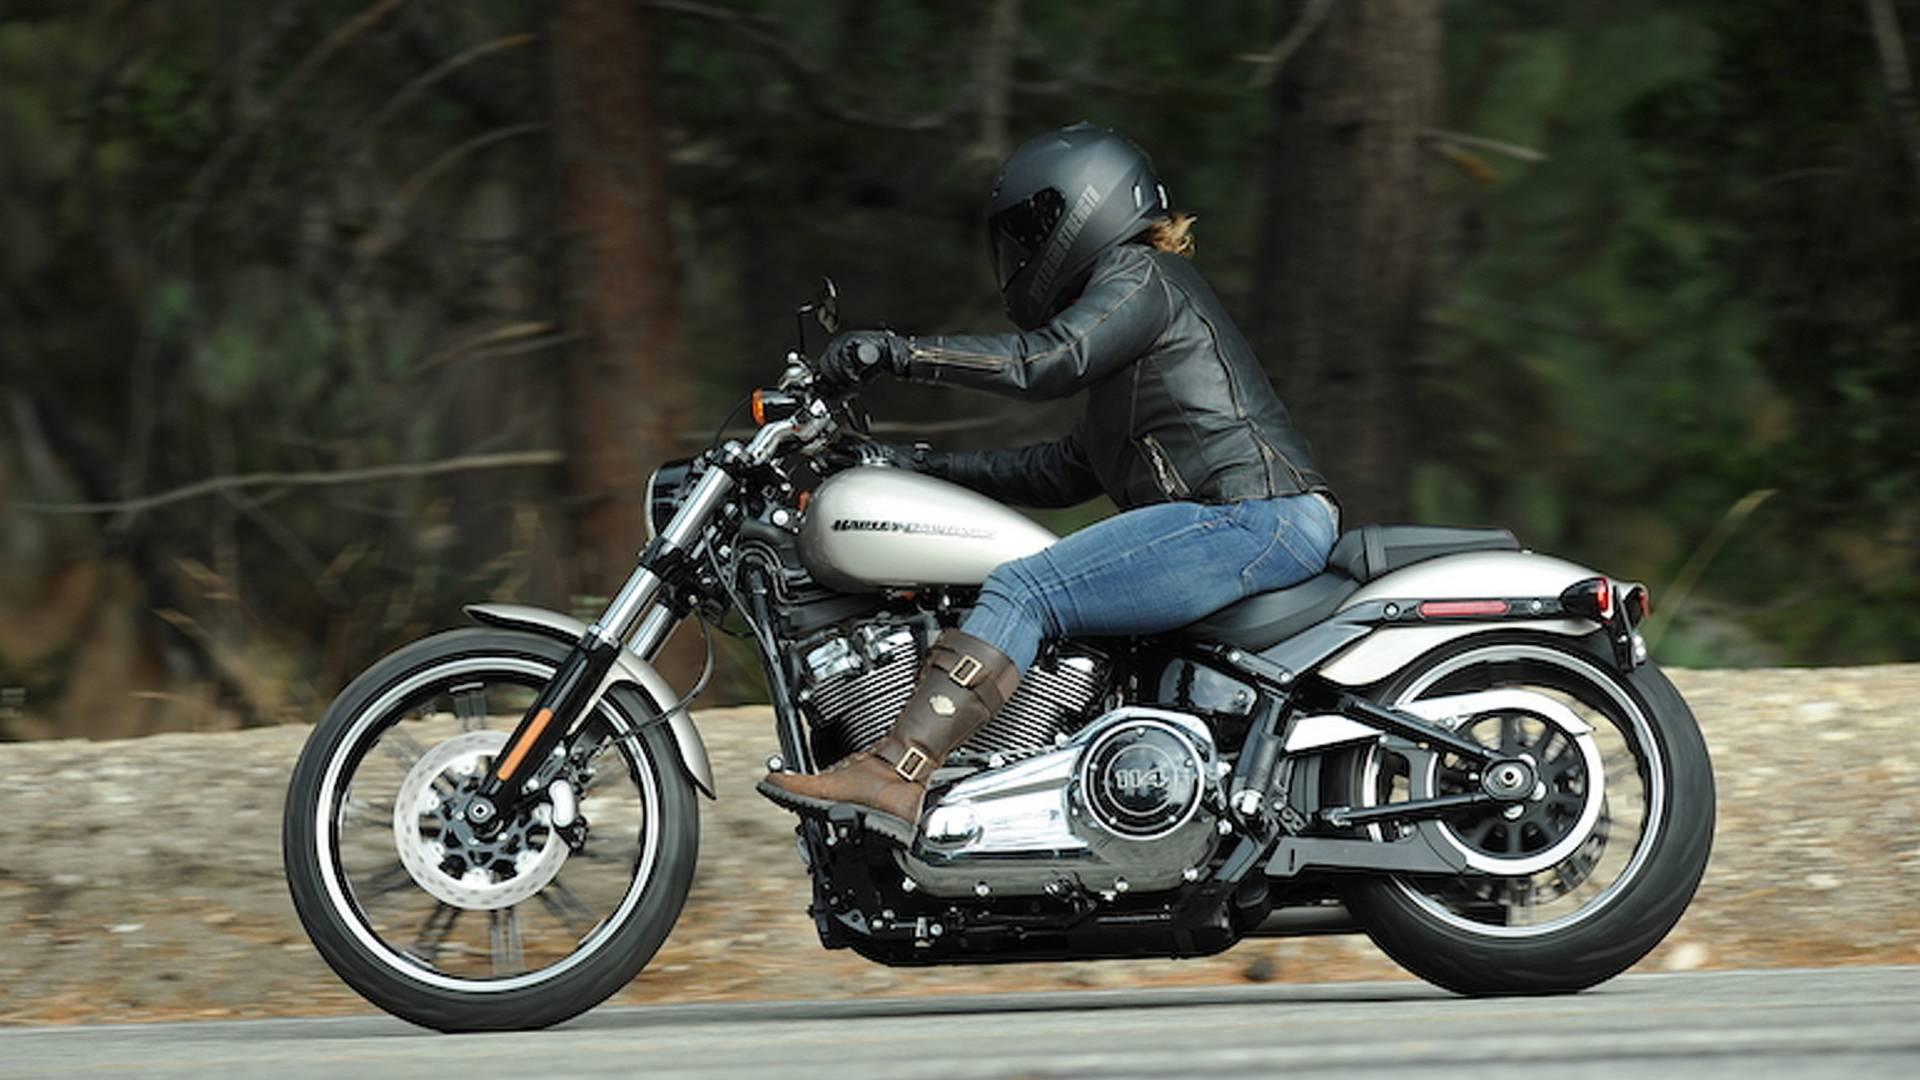 Harley davidson young rider series, scottish milf pussies tumblr